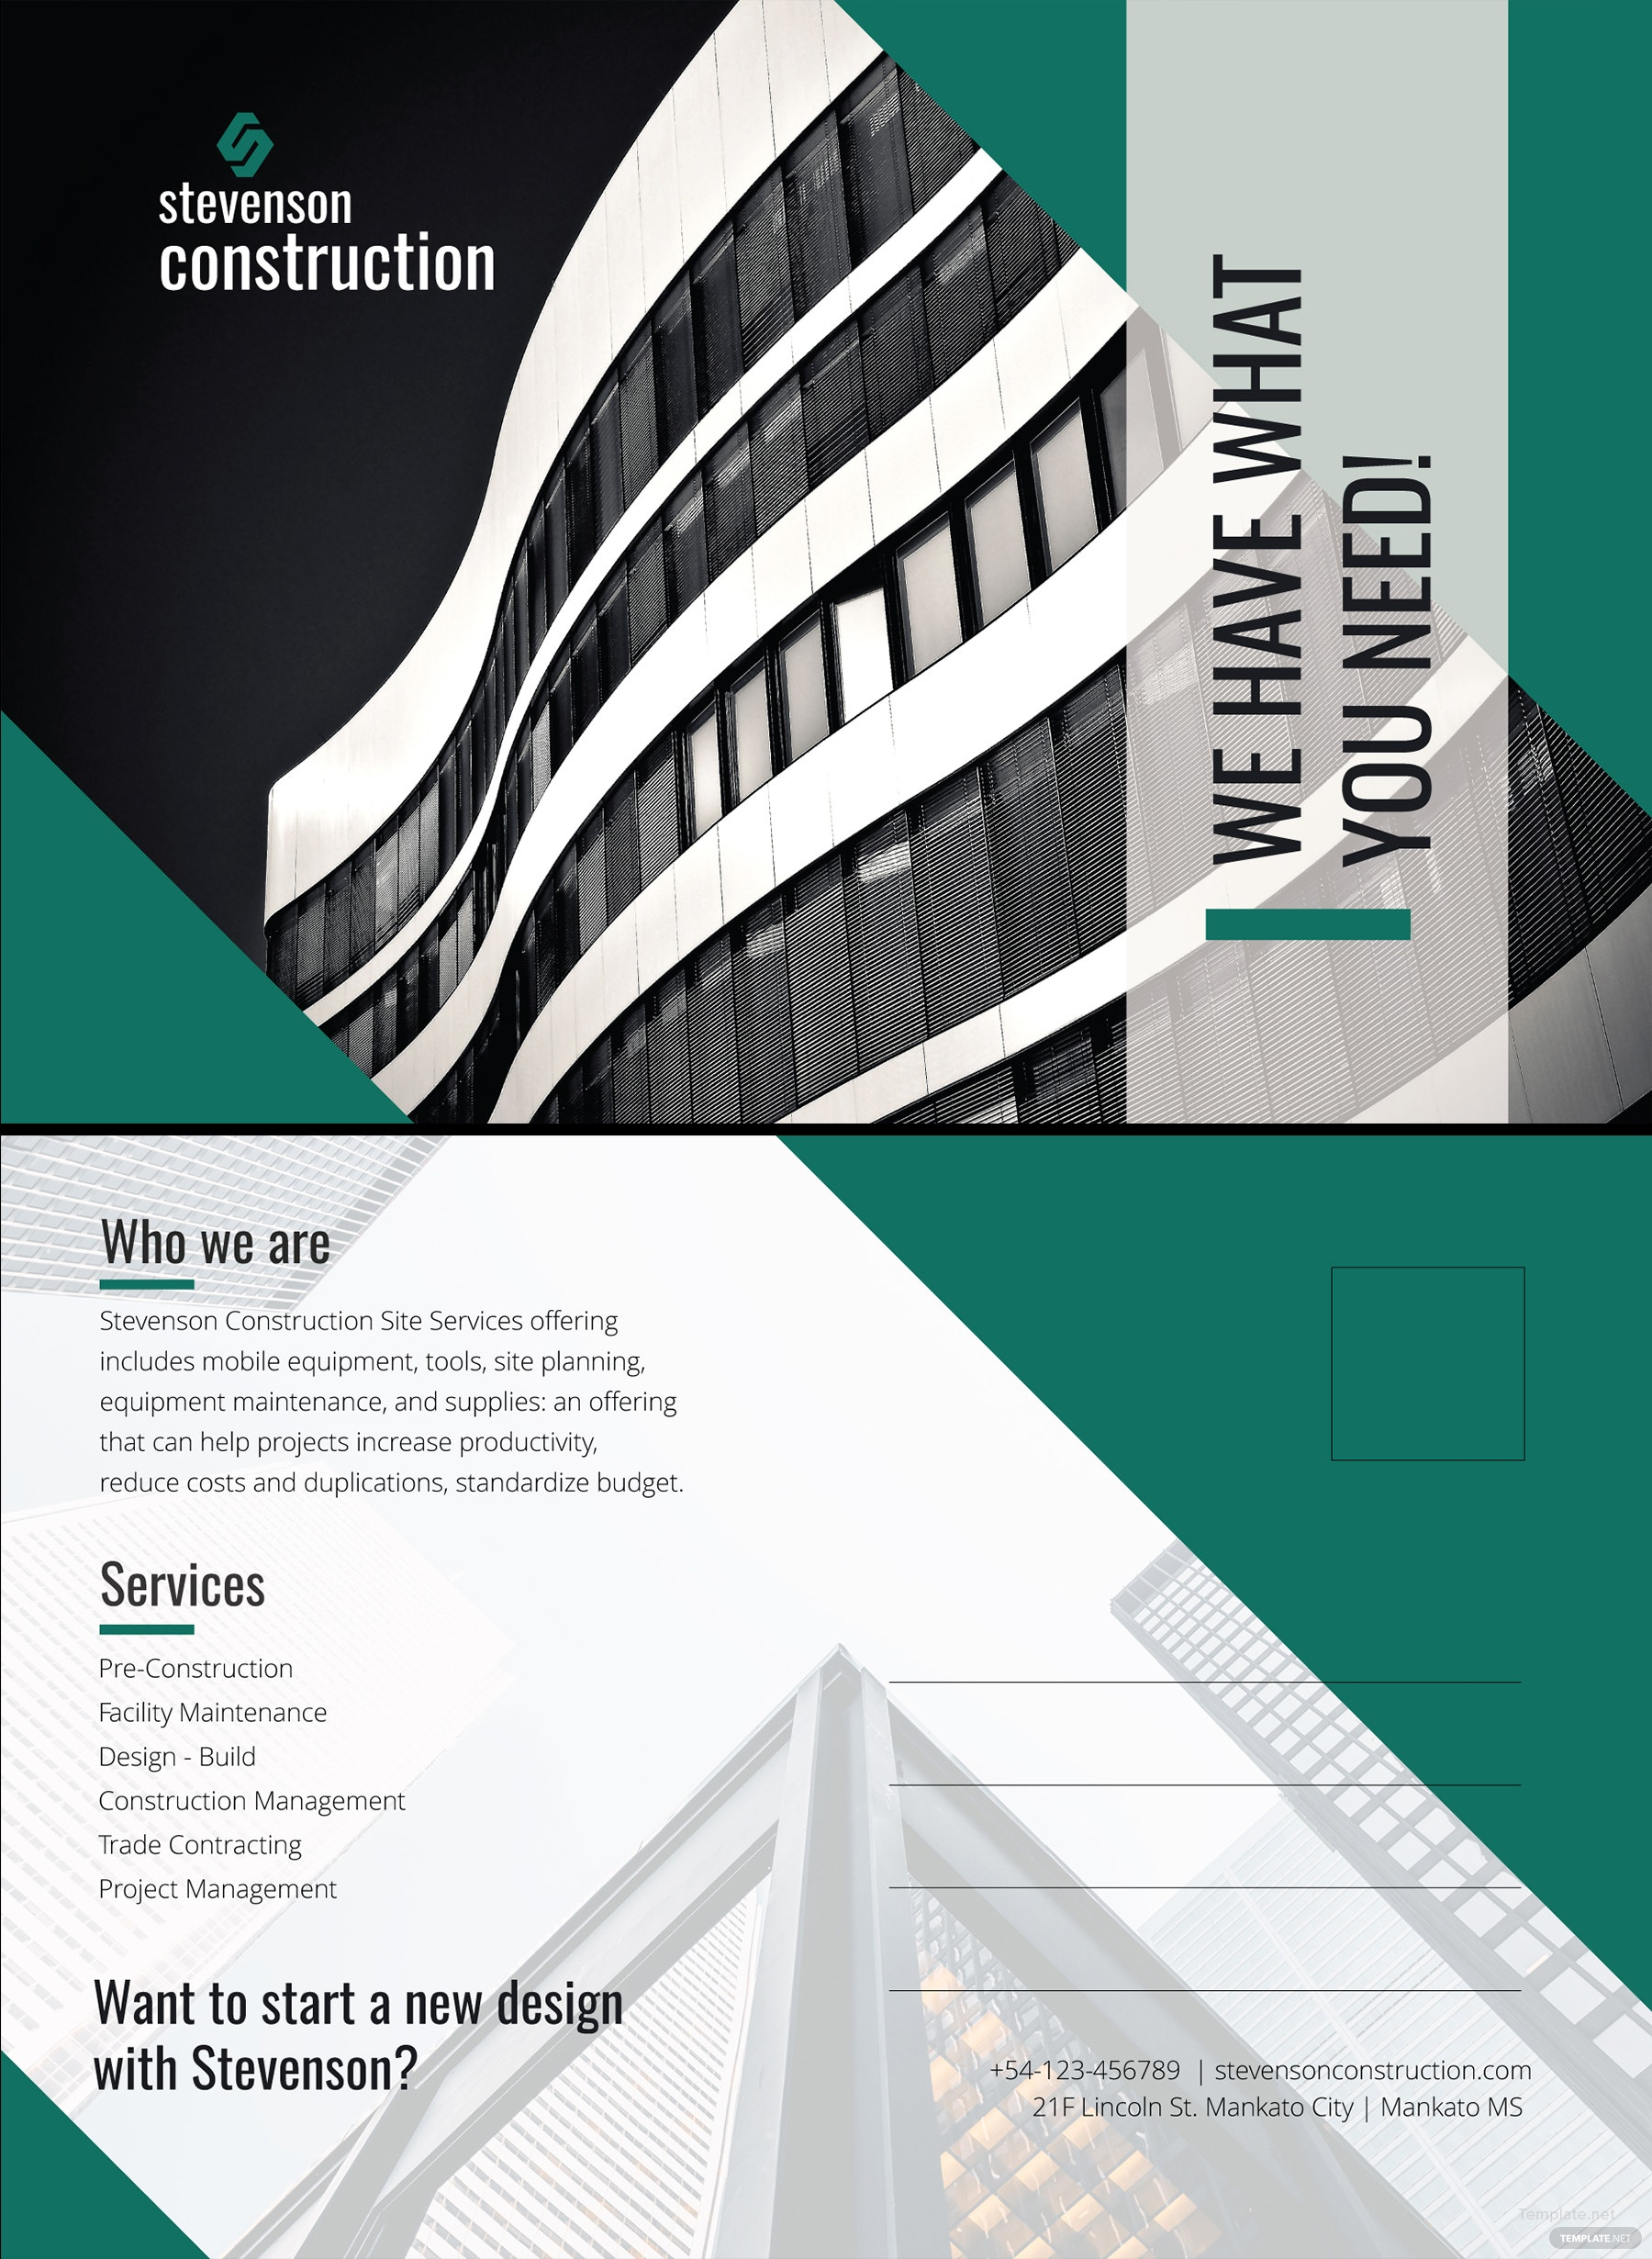 Free Construction Business Postcard Template In Microsoft Word - Unique business postcard template ideas